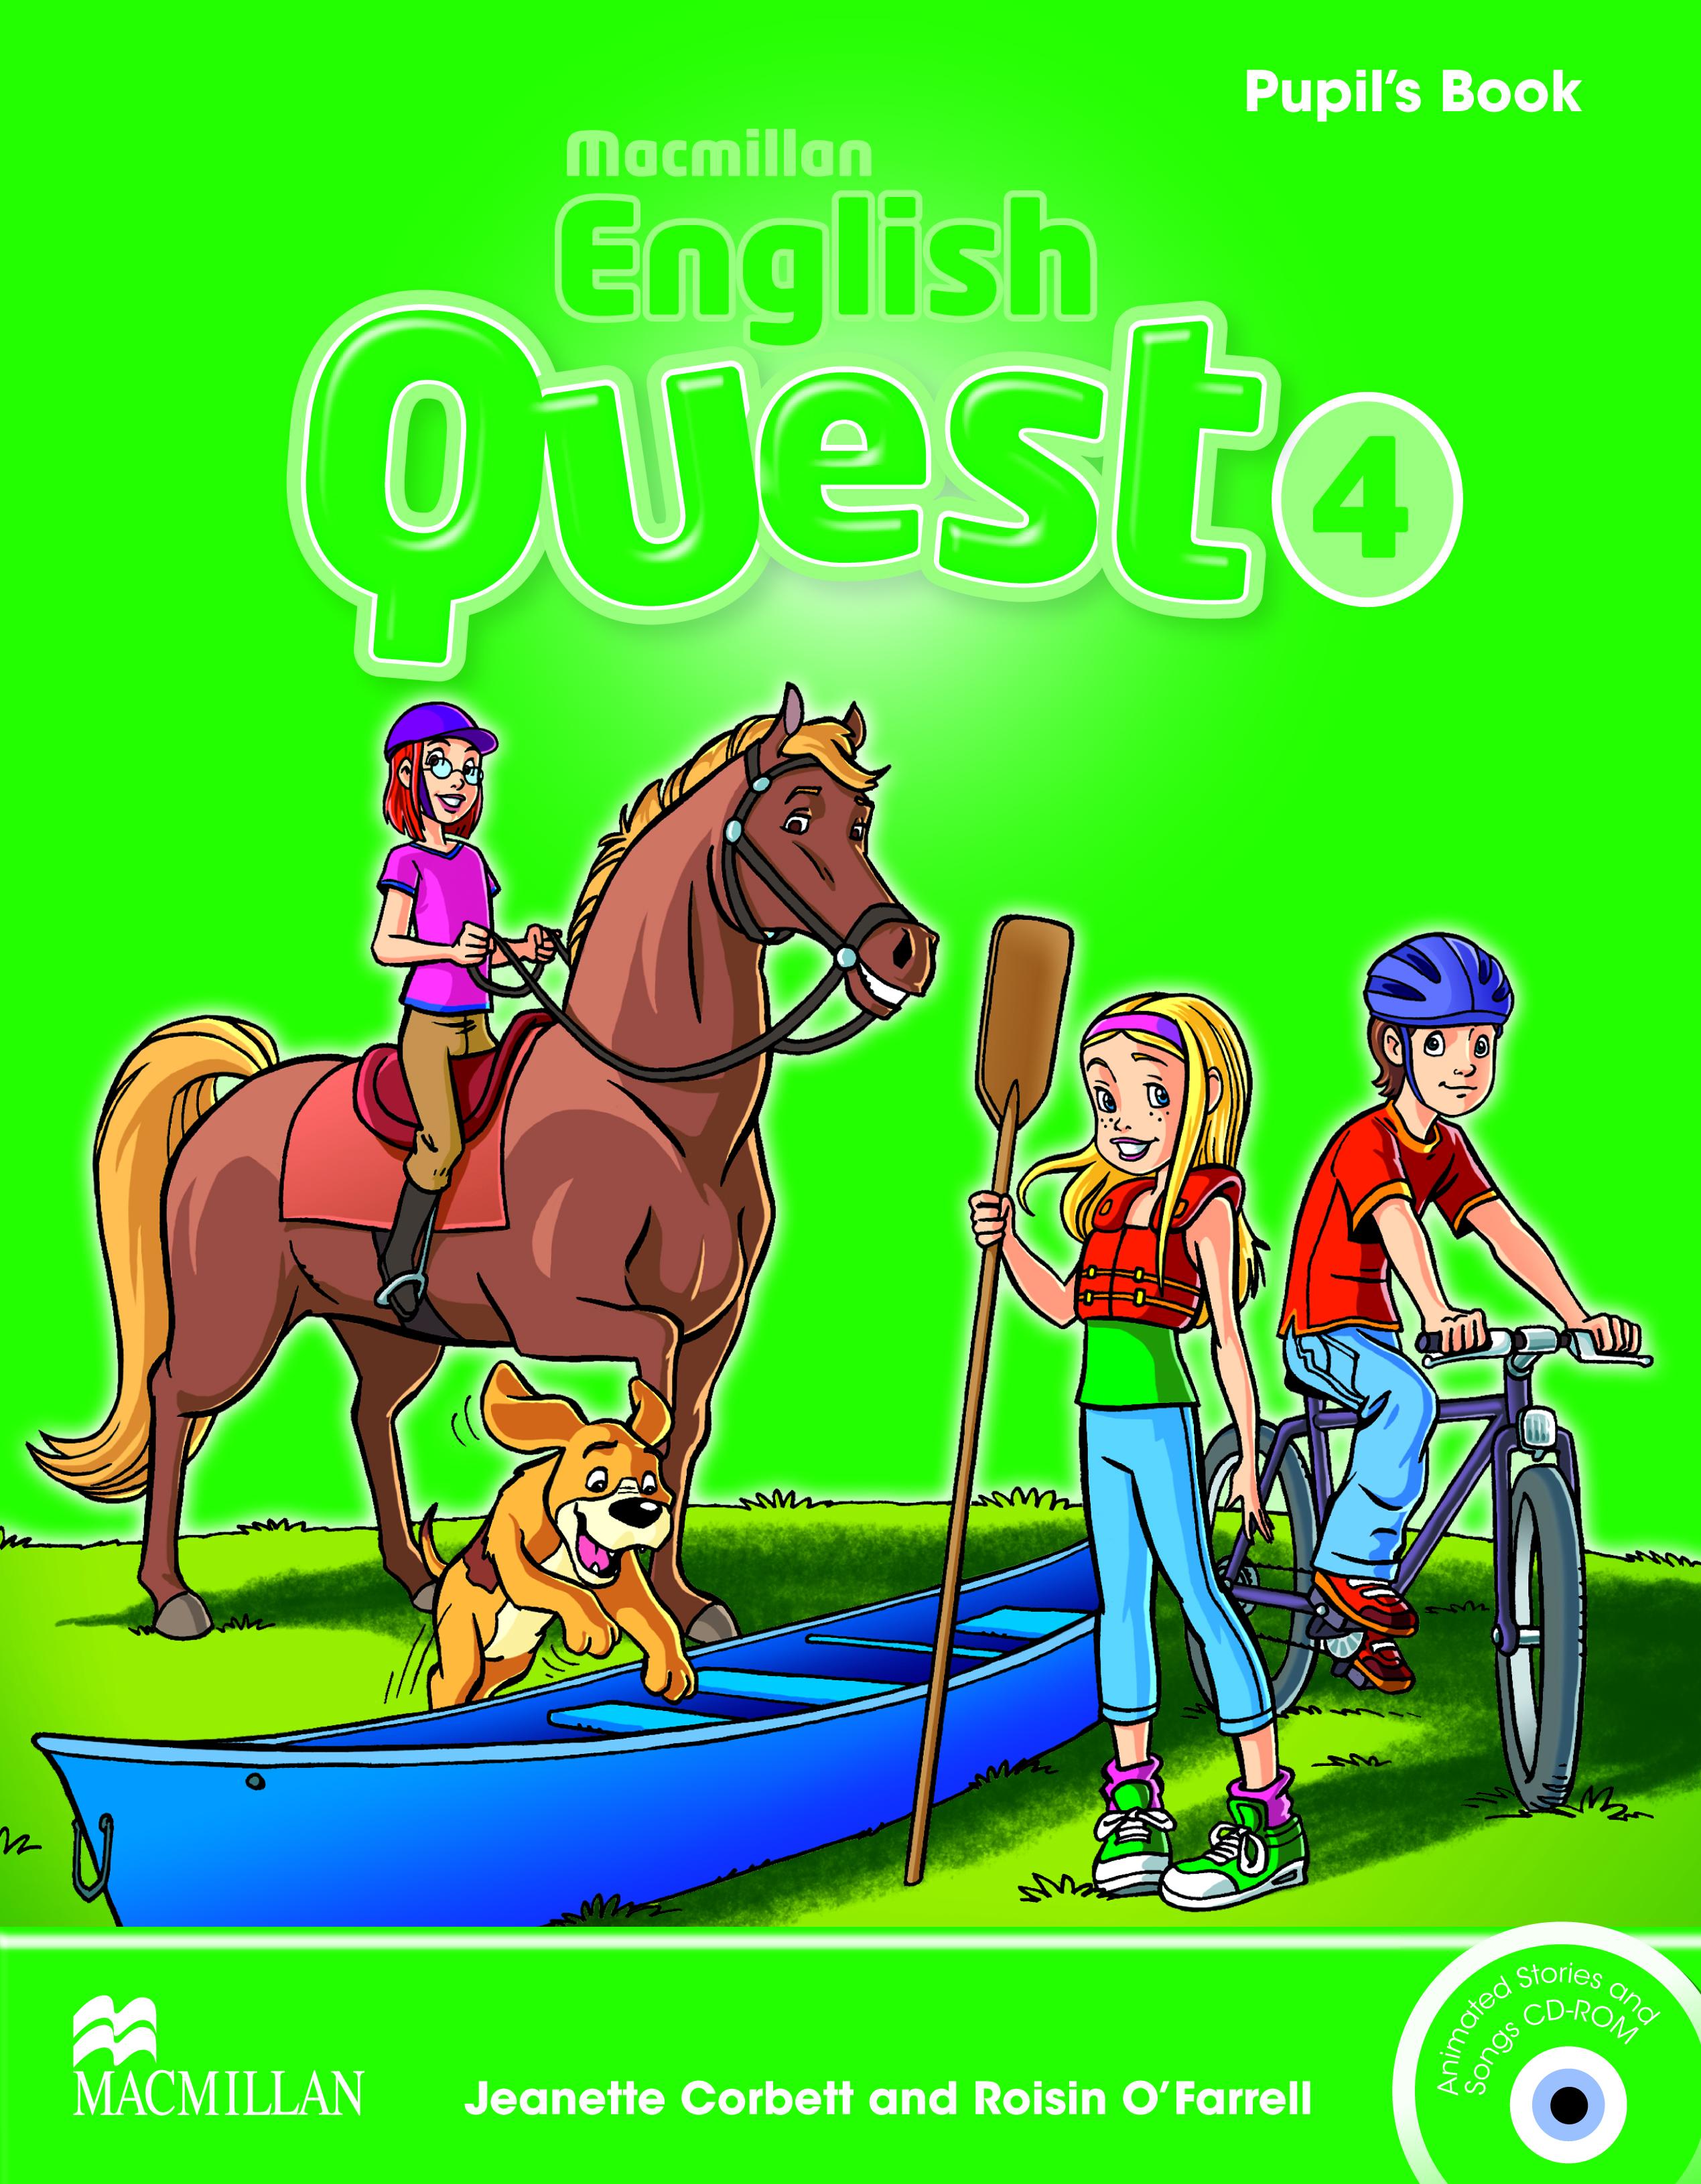 Macmillan English Quest 4 Pupil